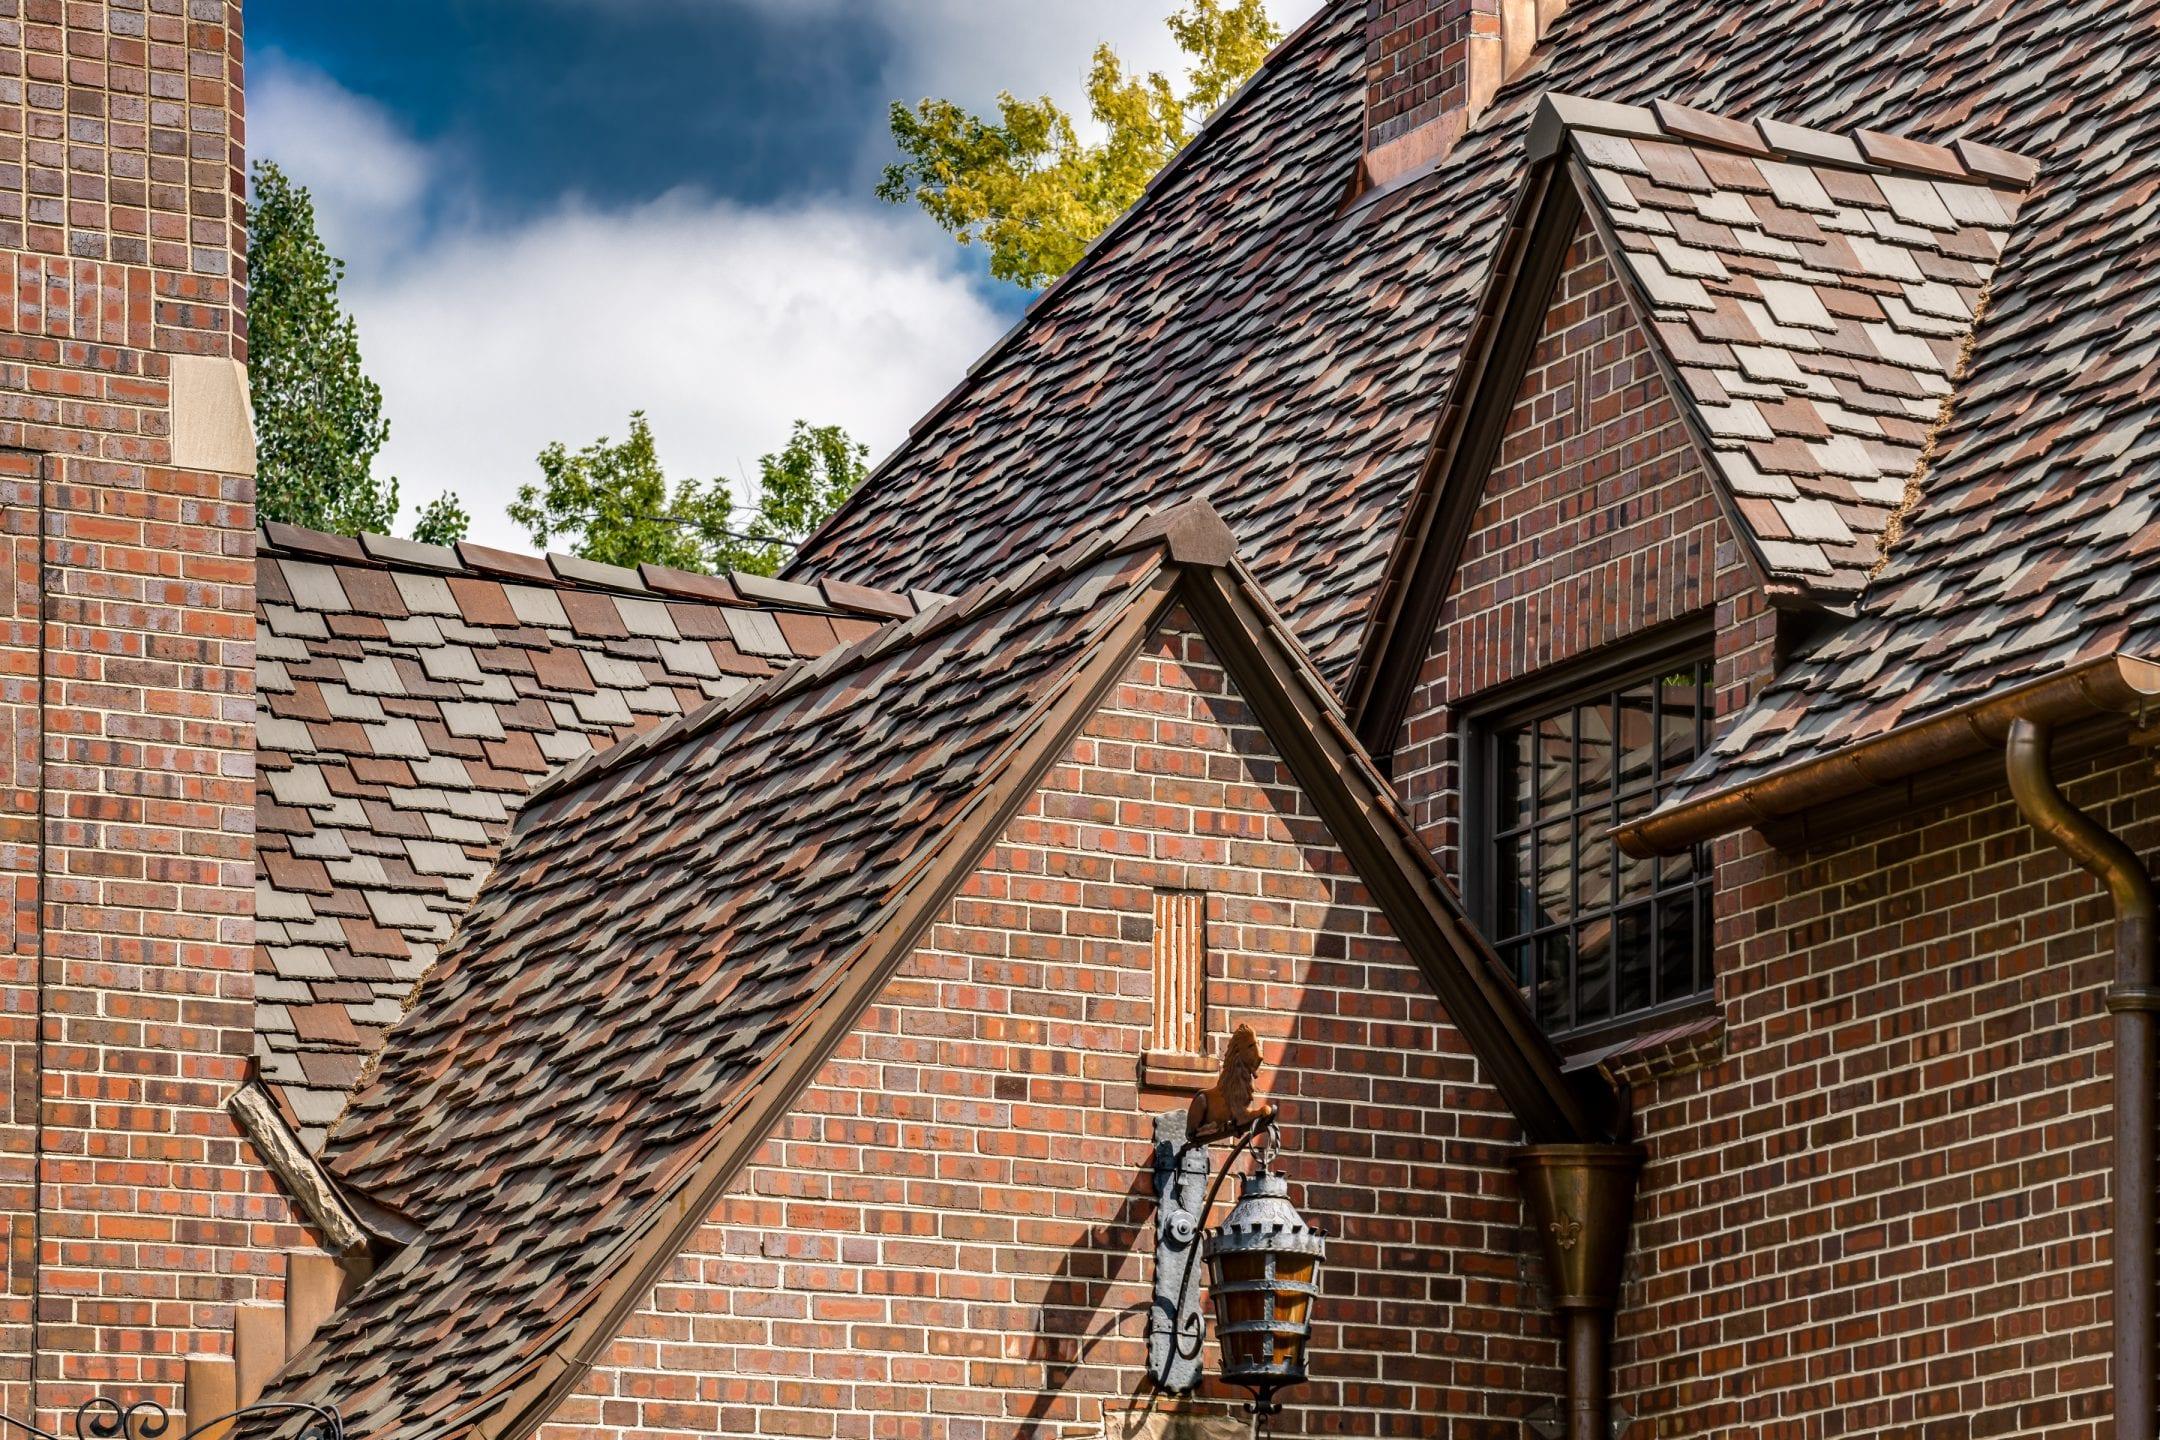 Private Residence - Denver | Ludowici Roof Tile